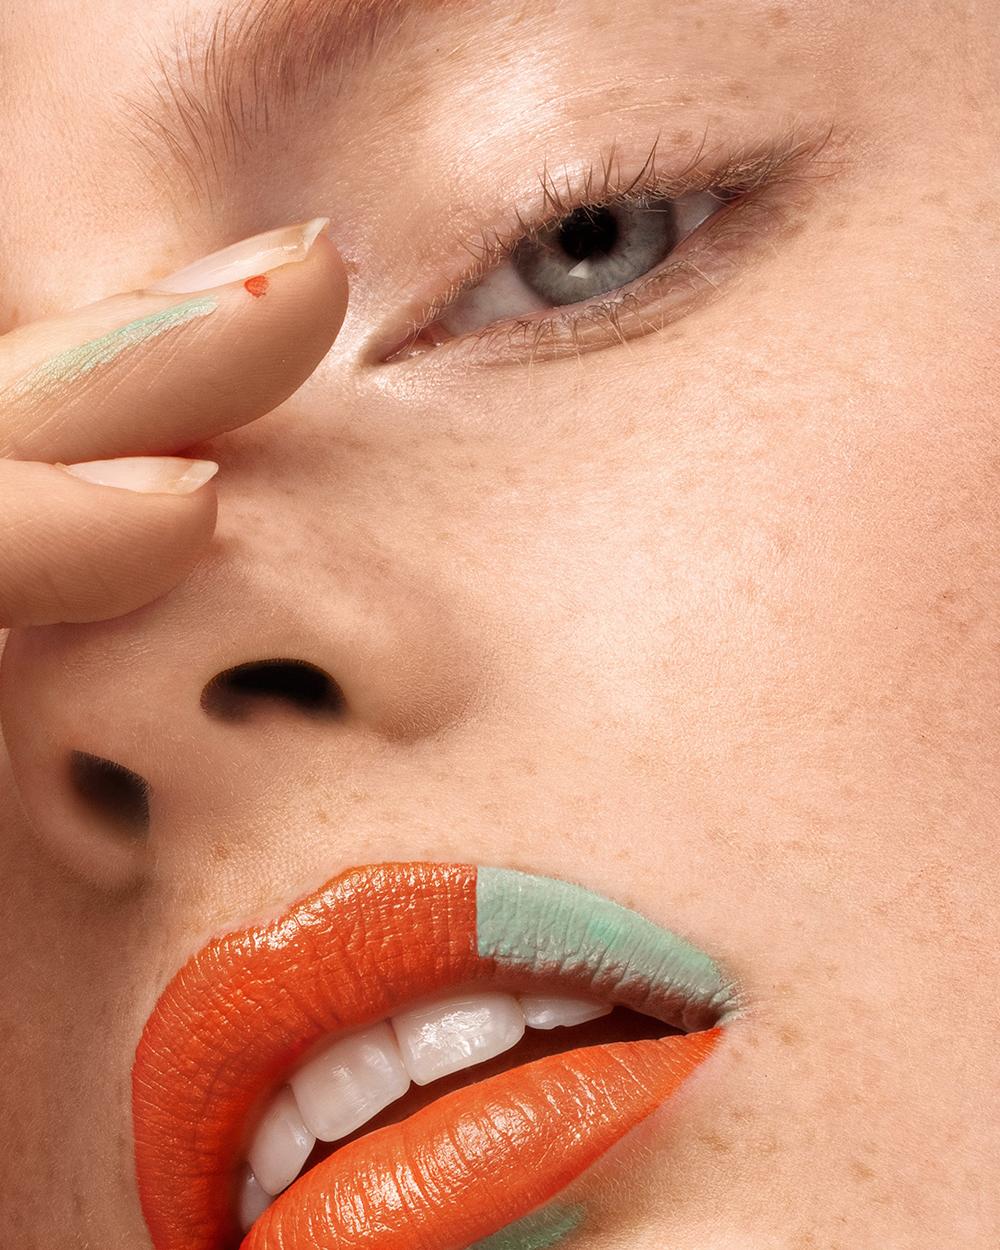 karin van berkel beauty fotografie met oranje lip en groen